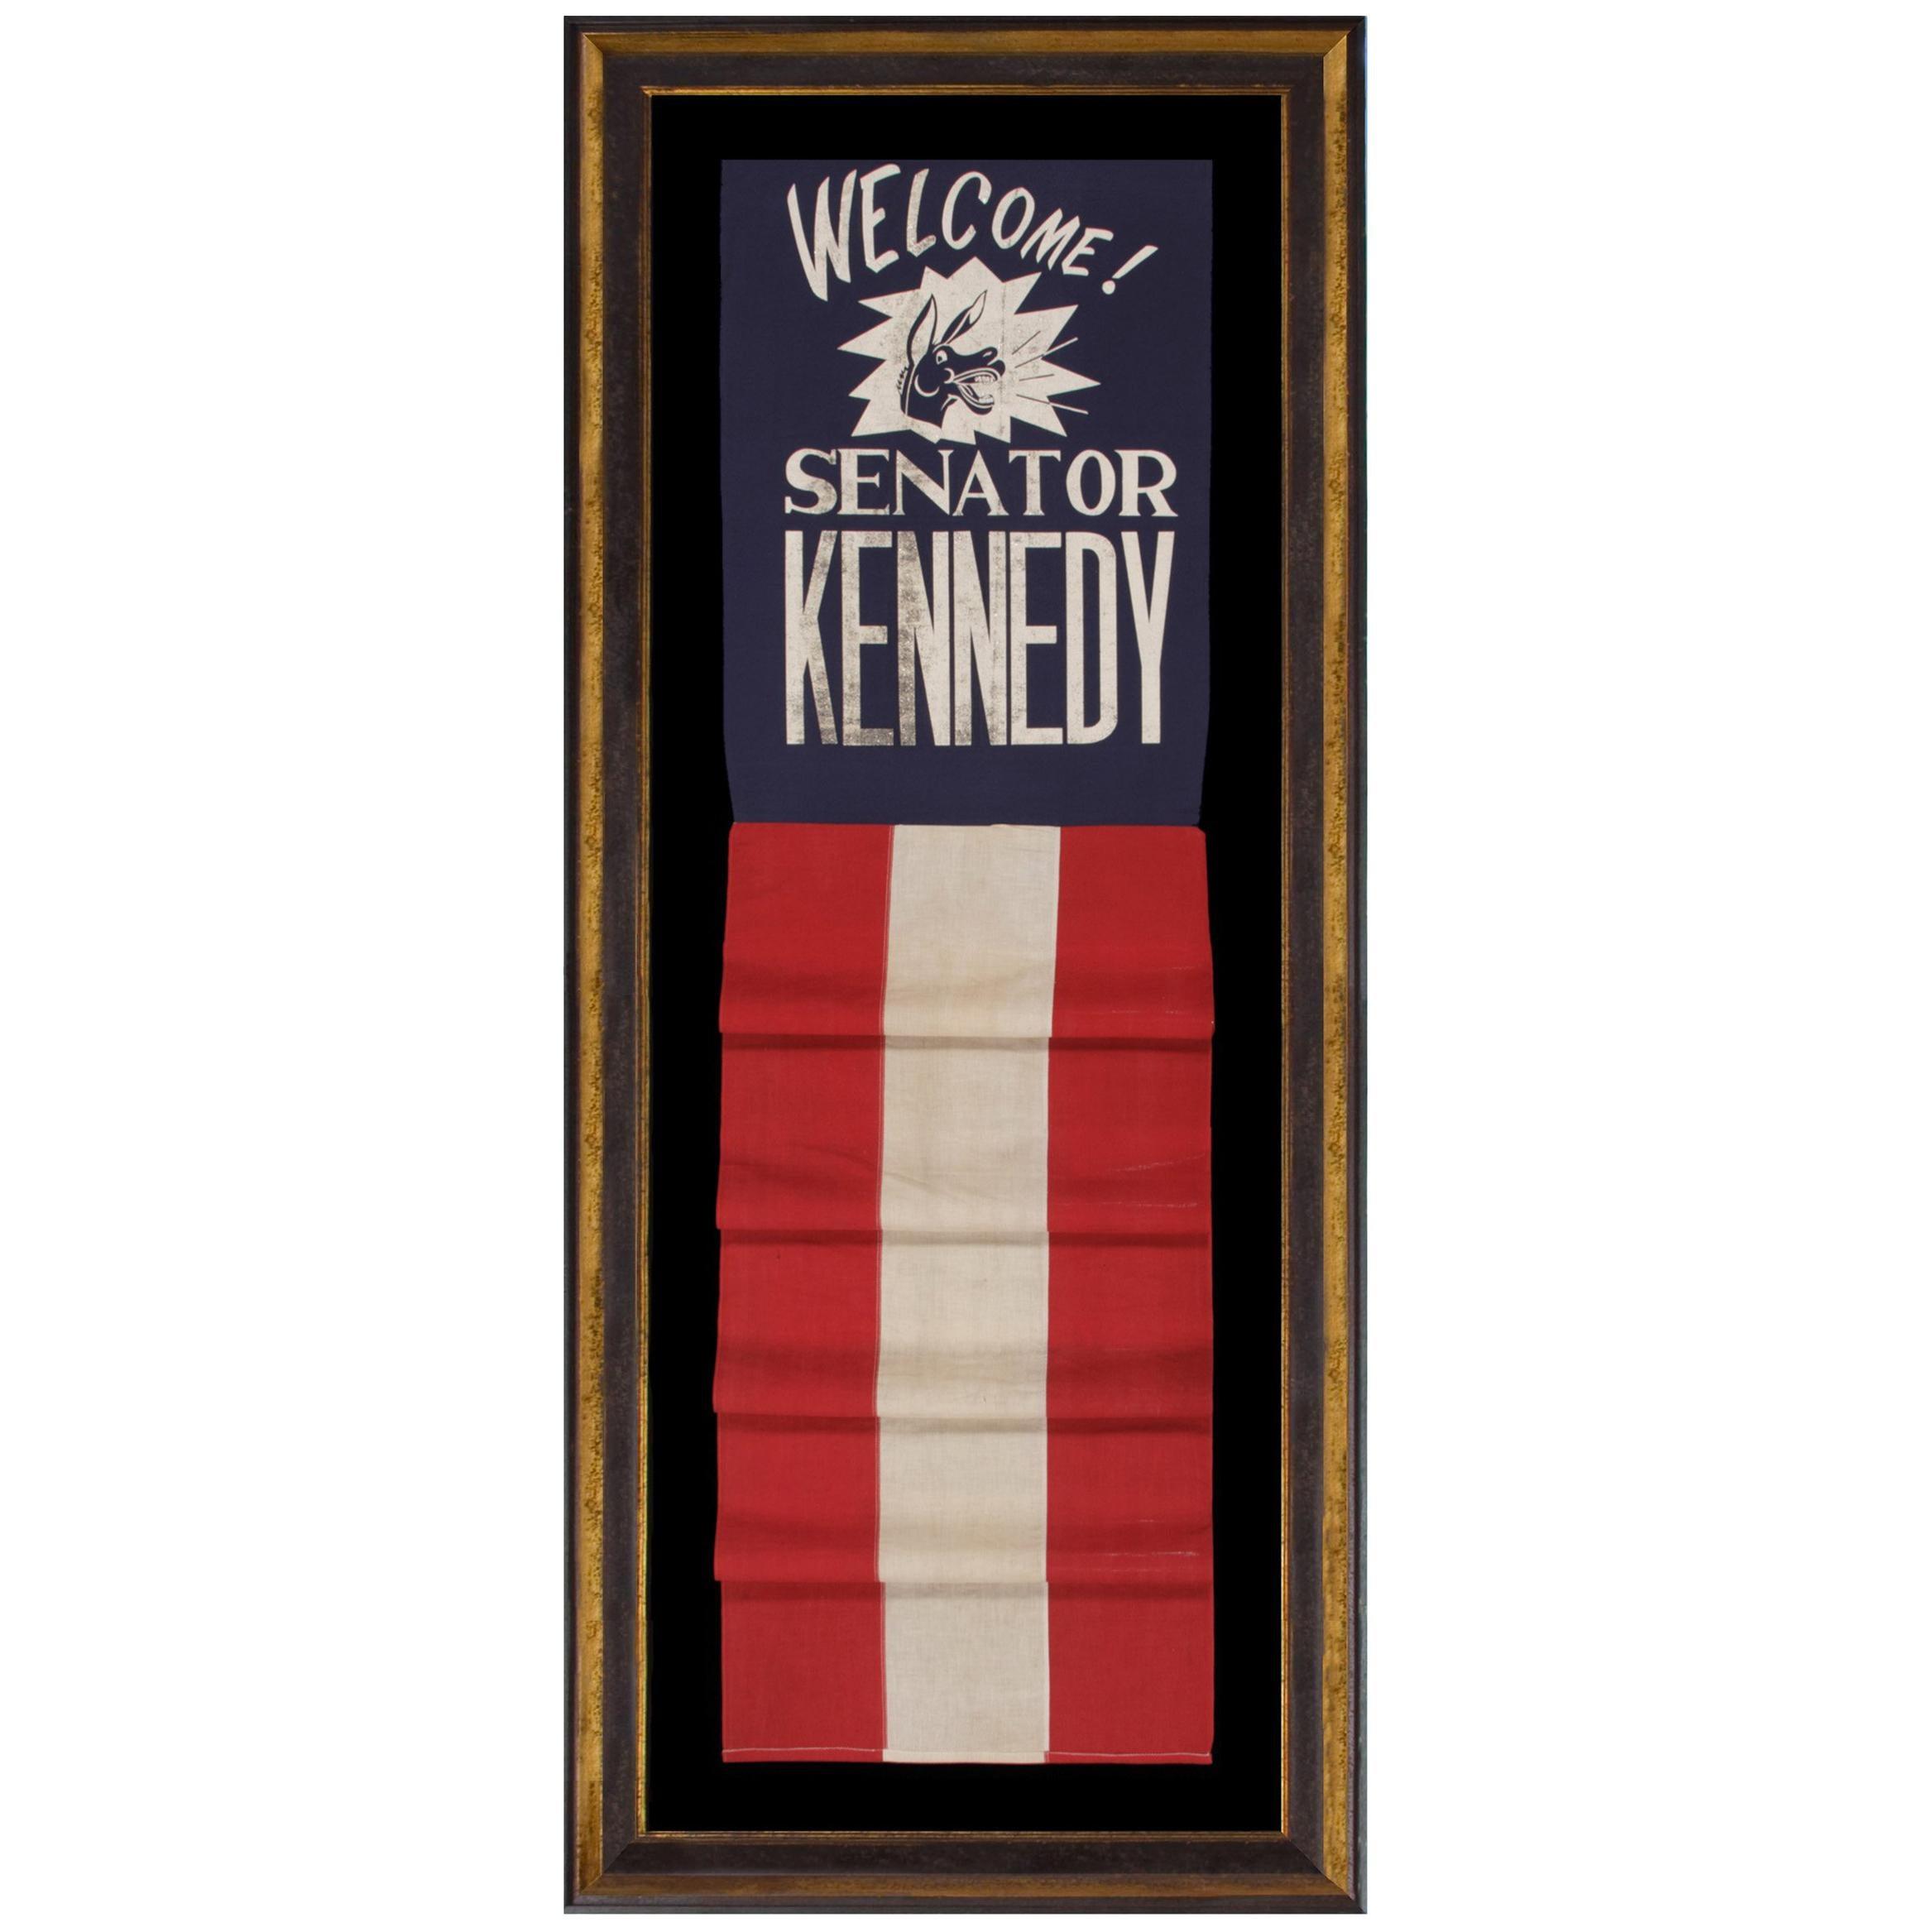 Graphic Banner Welcoming John F. Kennedy as Senator from Massachusetts